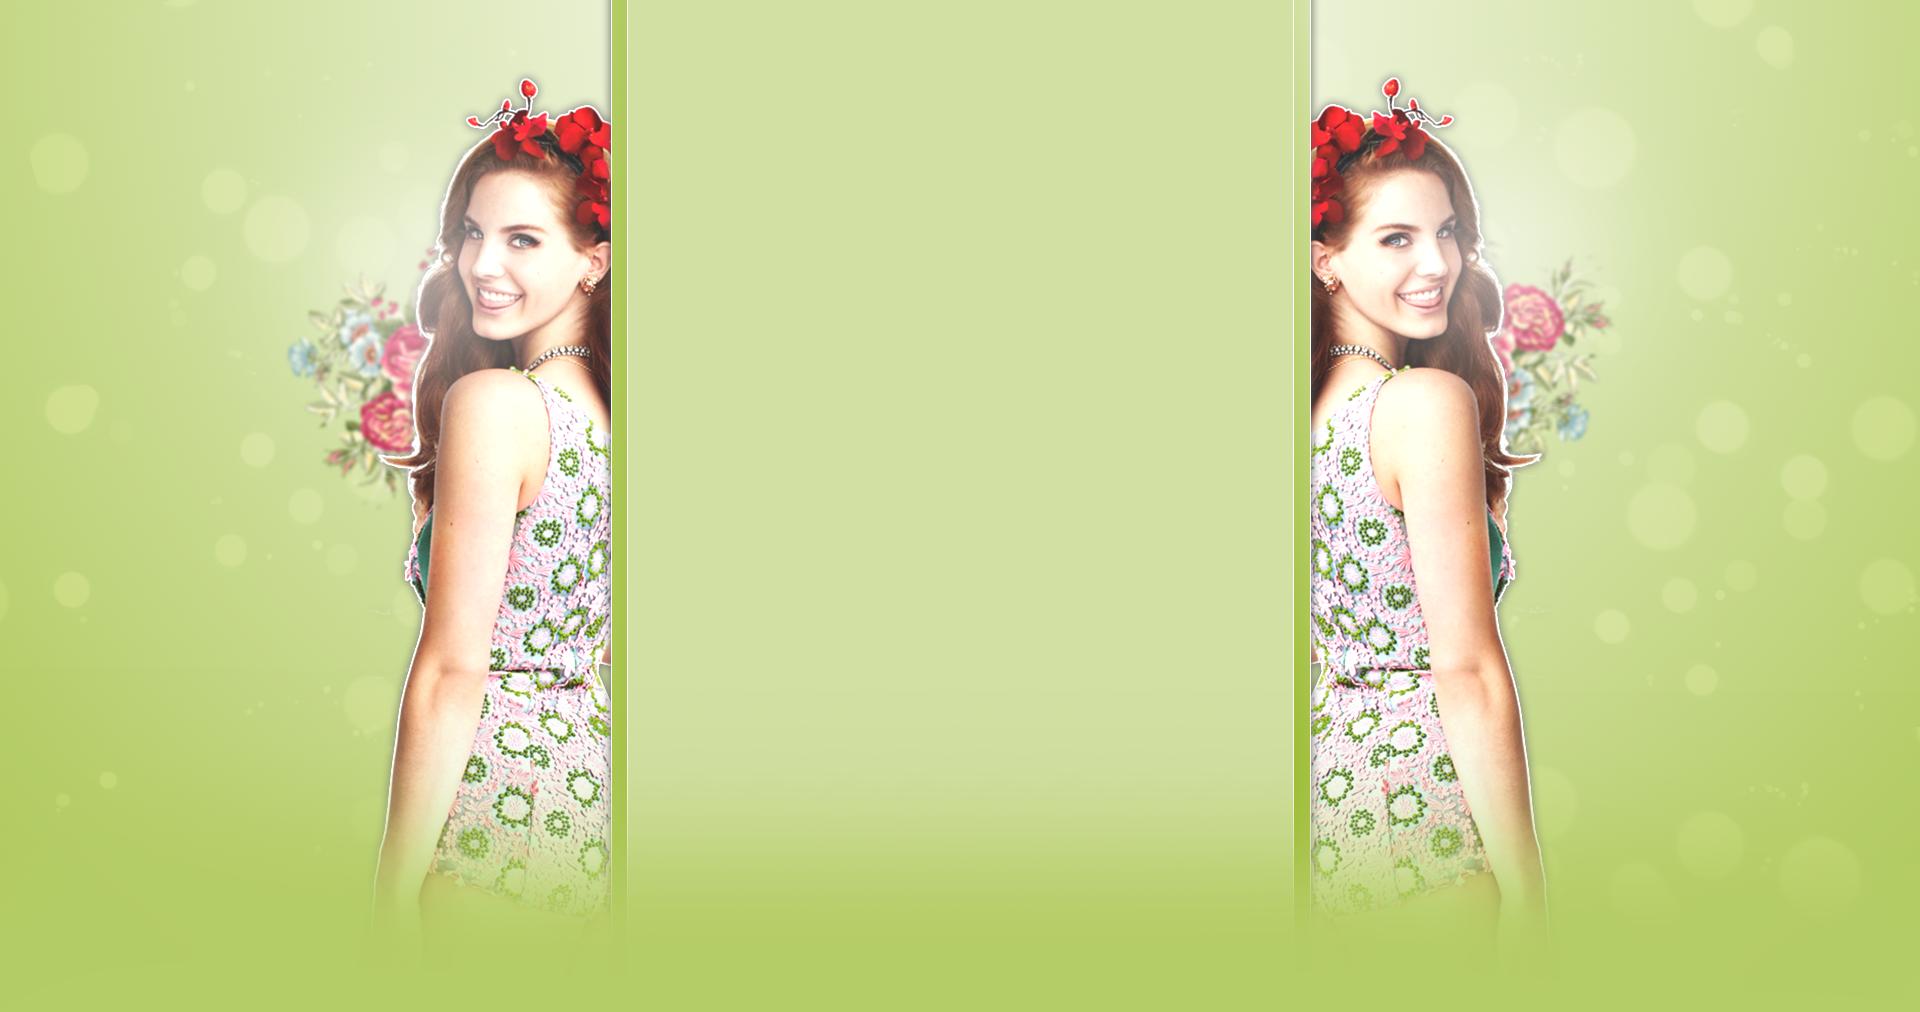 Iphone wallpaper tumblr lana - Lana Del Rey Background Tumblr Www Imgkid Com The Lana Del Rey Iphone Wallpapers